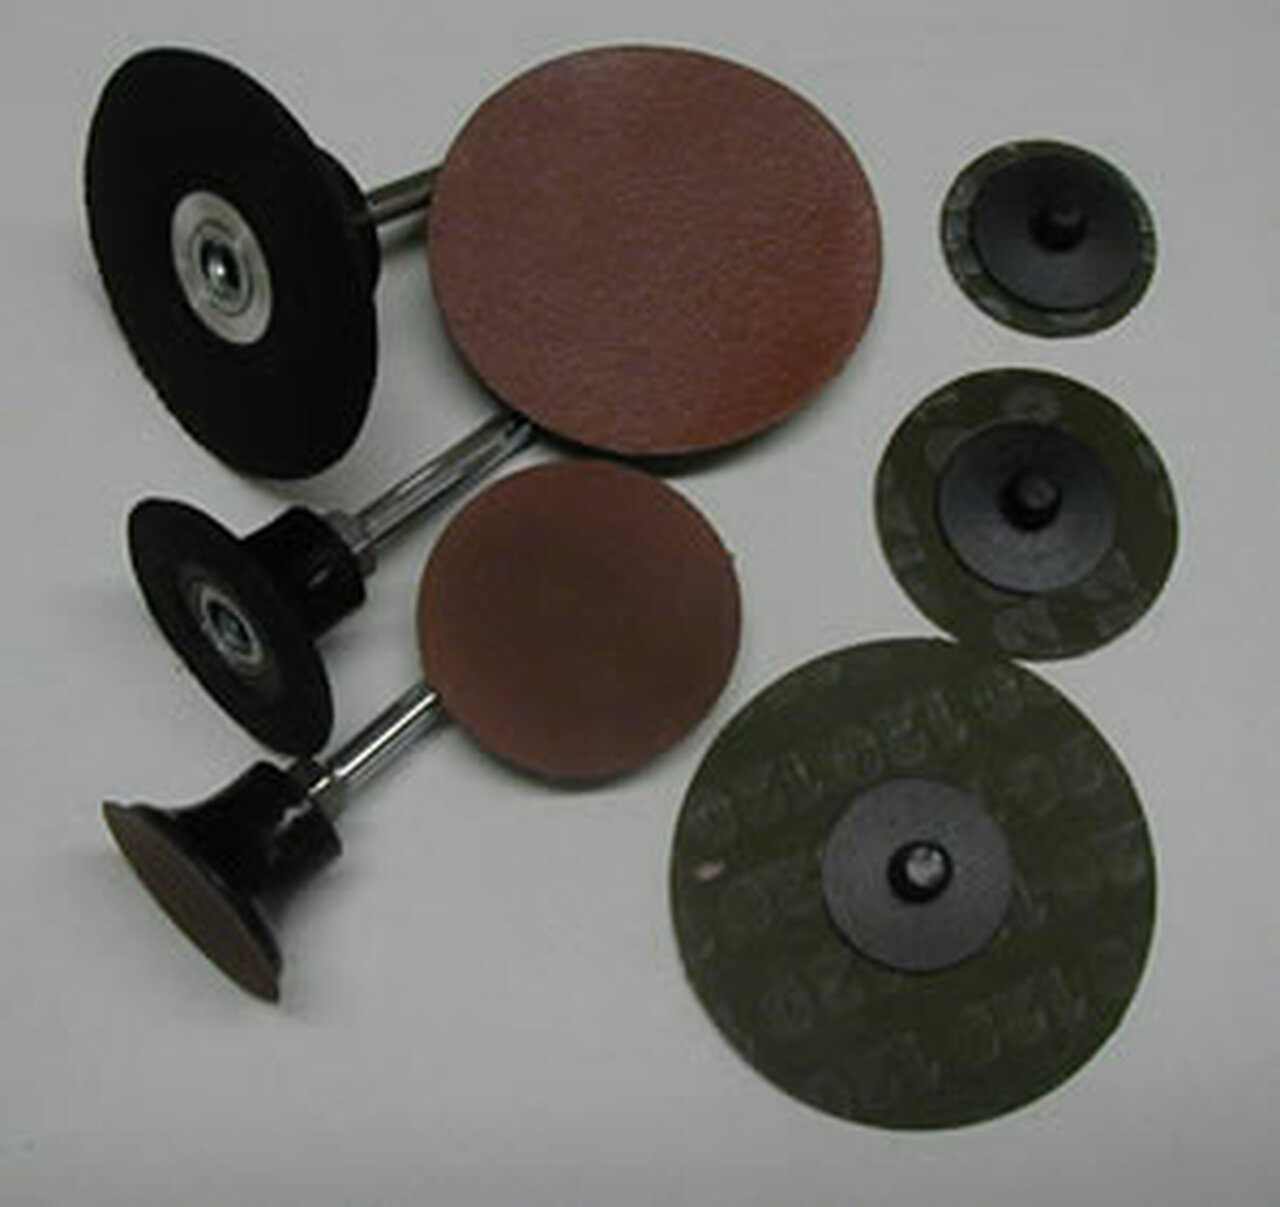 "Aluminum Oxide Sanding Disk 1.5"" - 36 Grit"